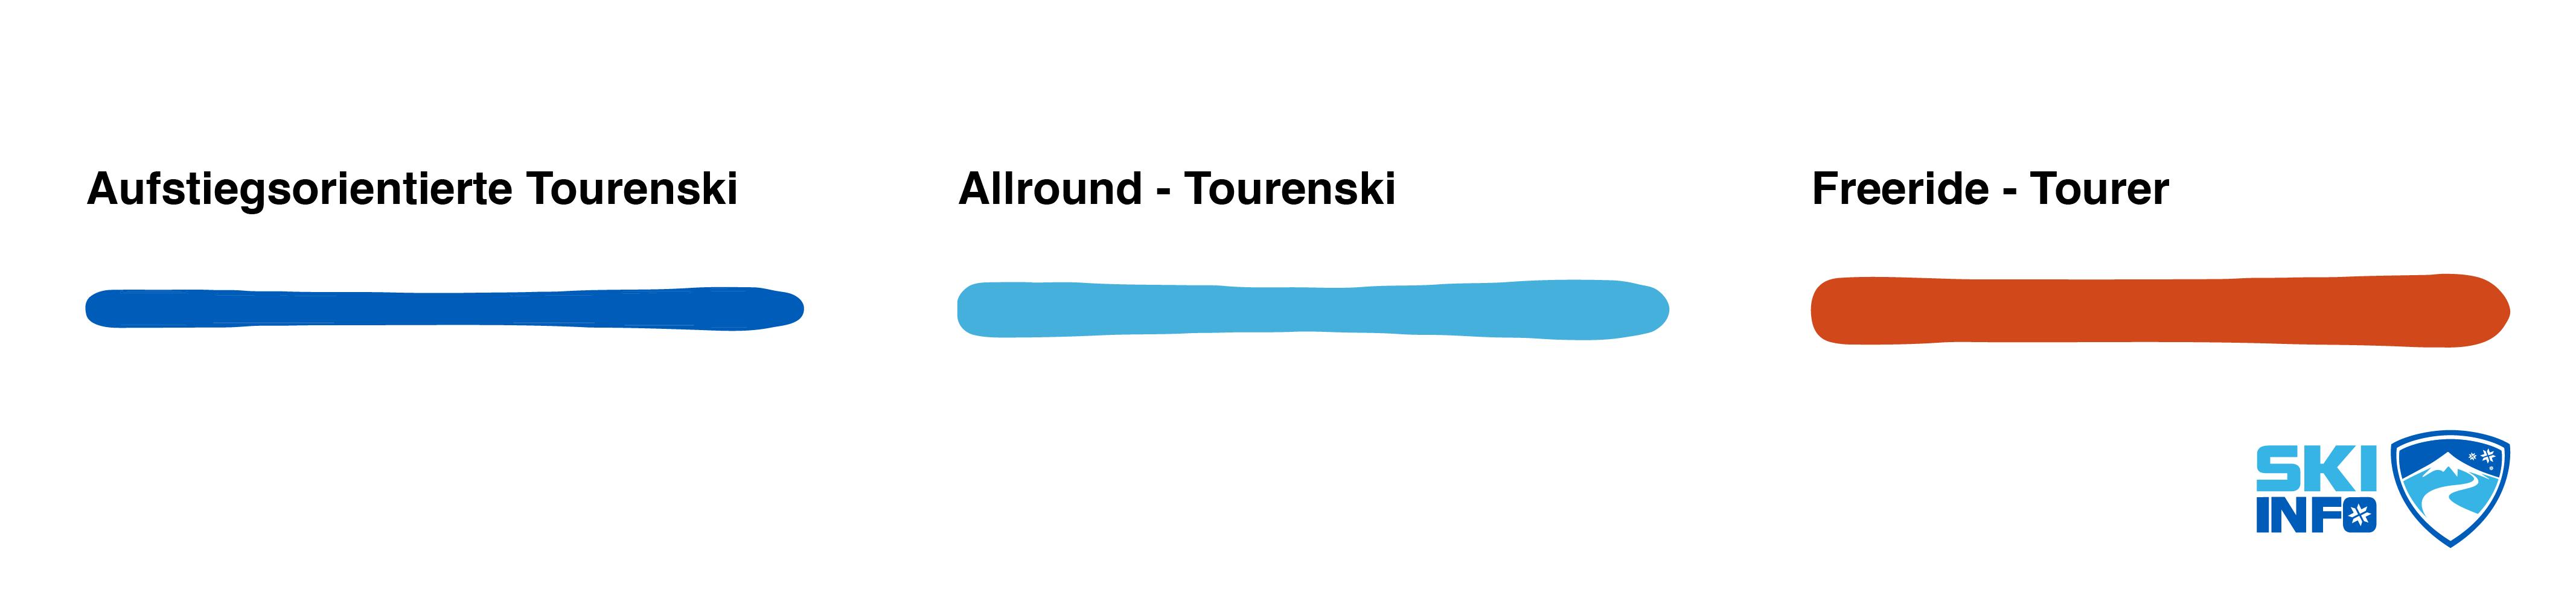 Welcher Tourenski zum Skitourengehen?